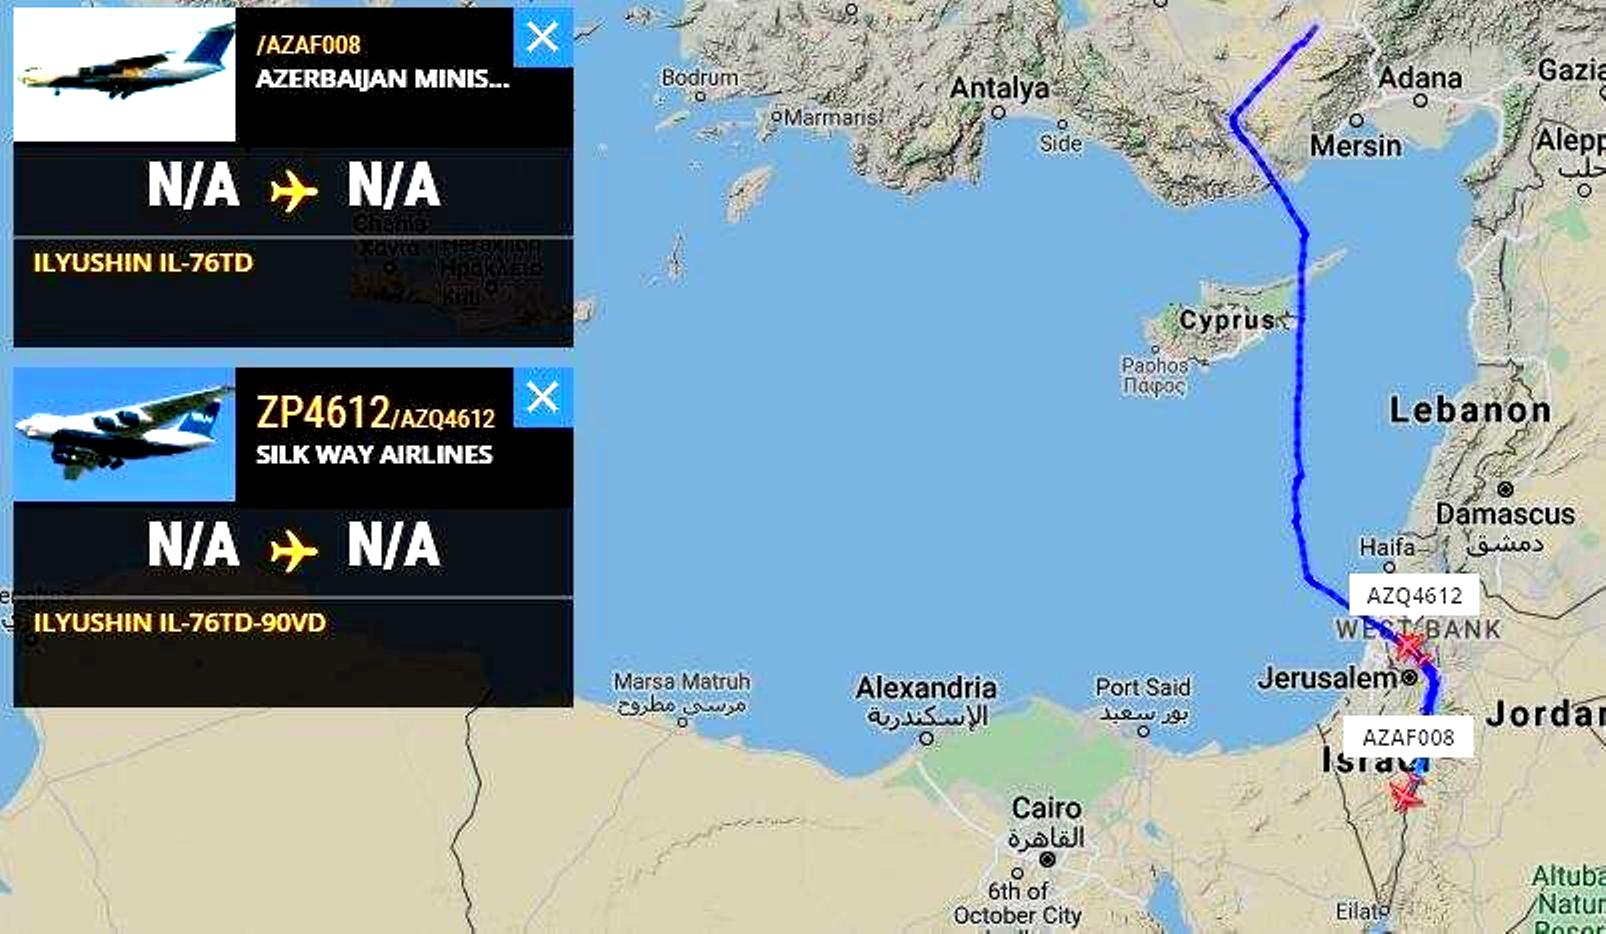 To Ισραήλ ενισχύει στρατιωτικά το Αζερμπαϊτζάν